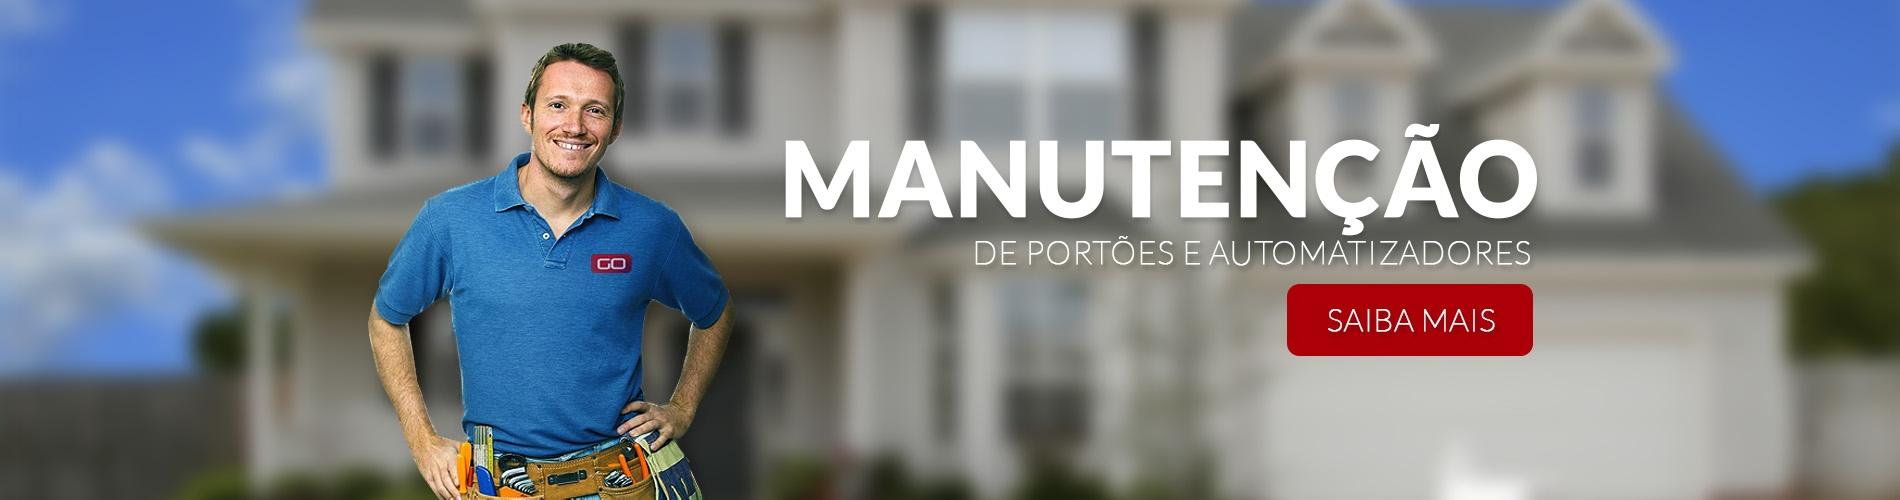 manutencao-de-portao-automatico-grupooliveirasportoes-banner1